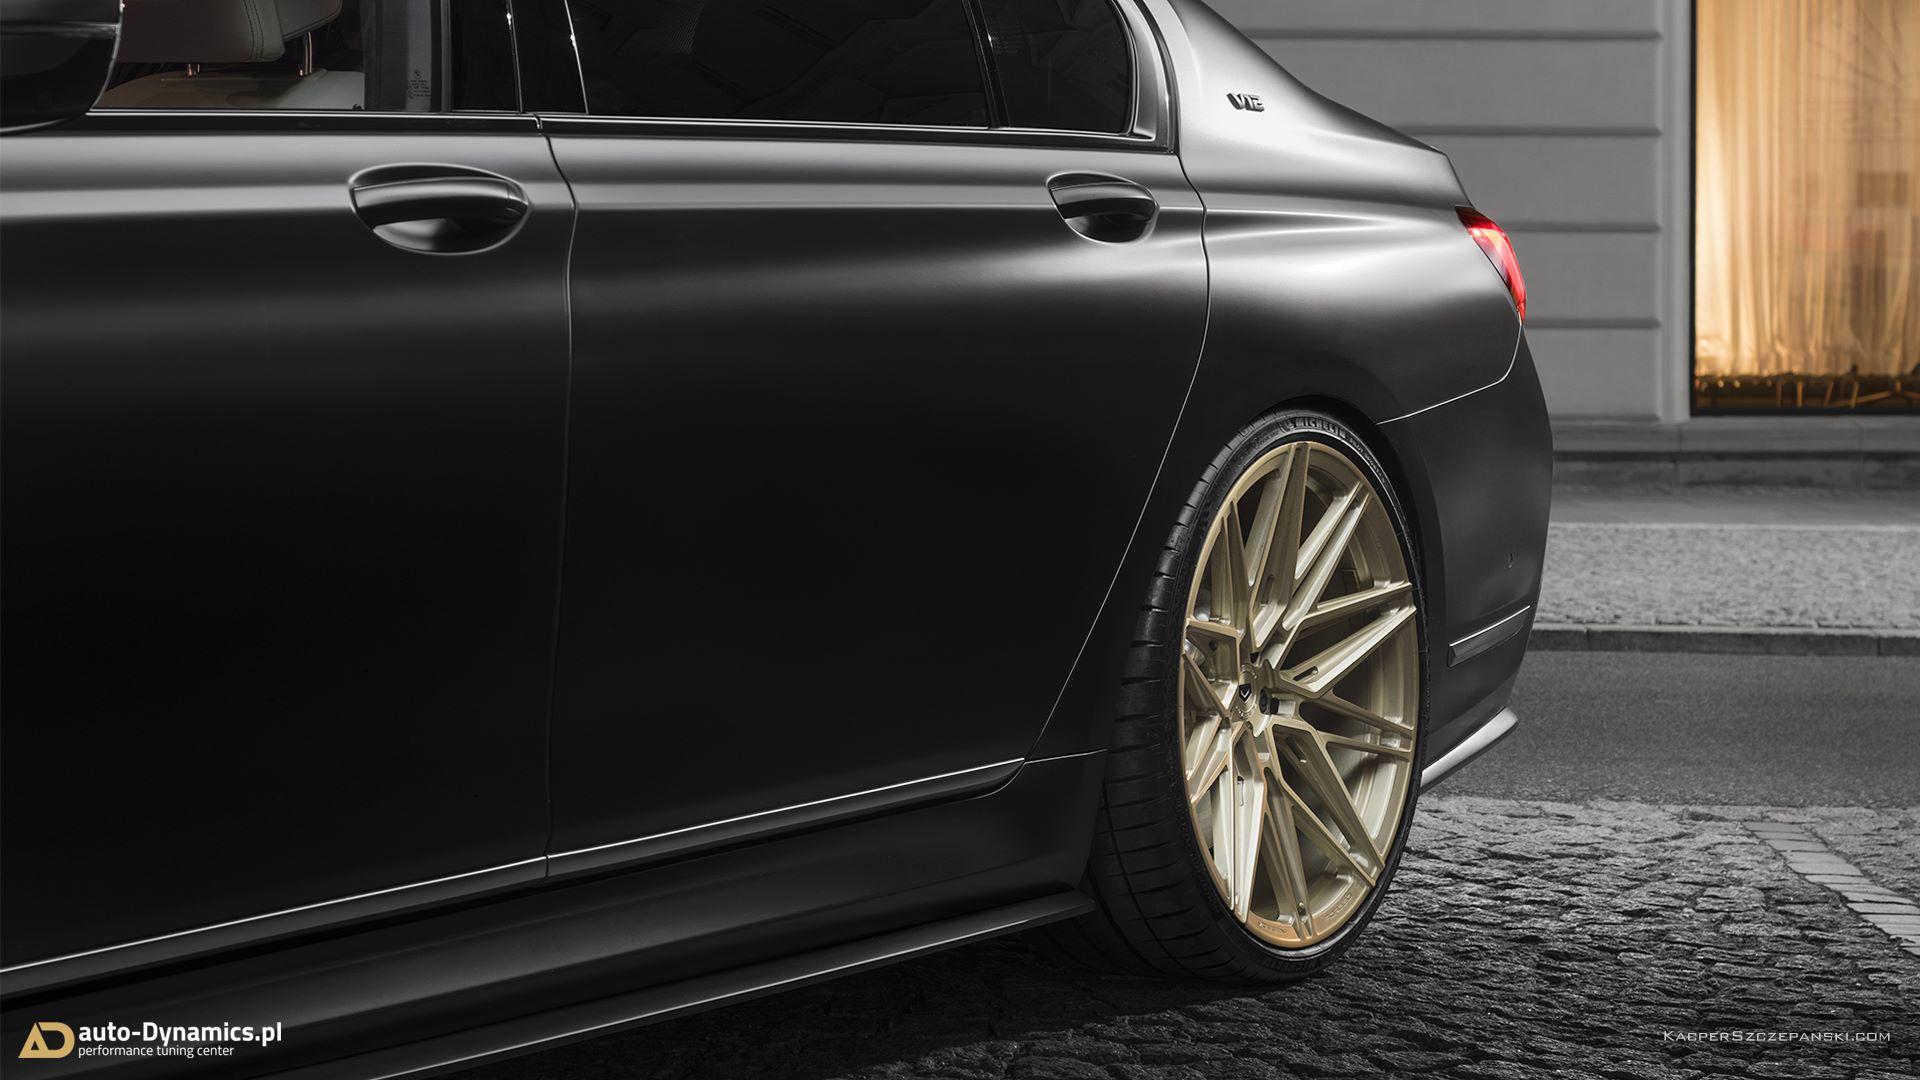 BMW-M760Li-by-Auto-Dynamics-9